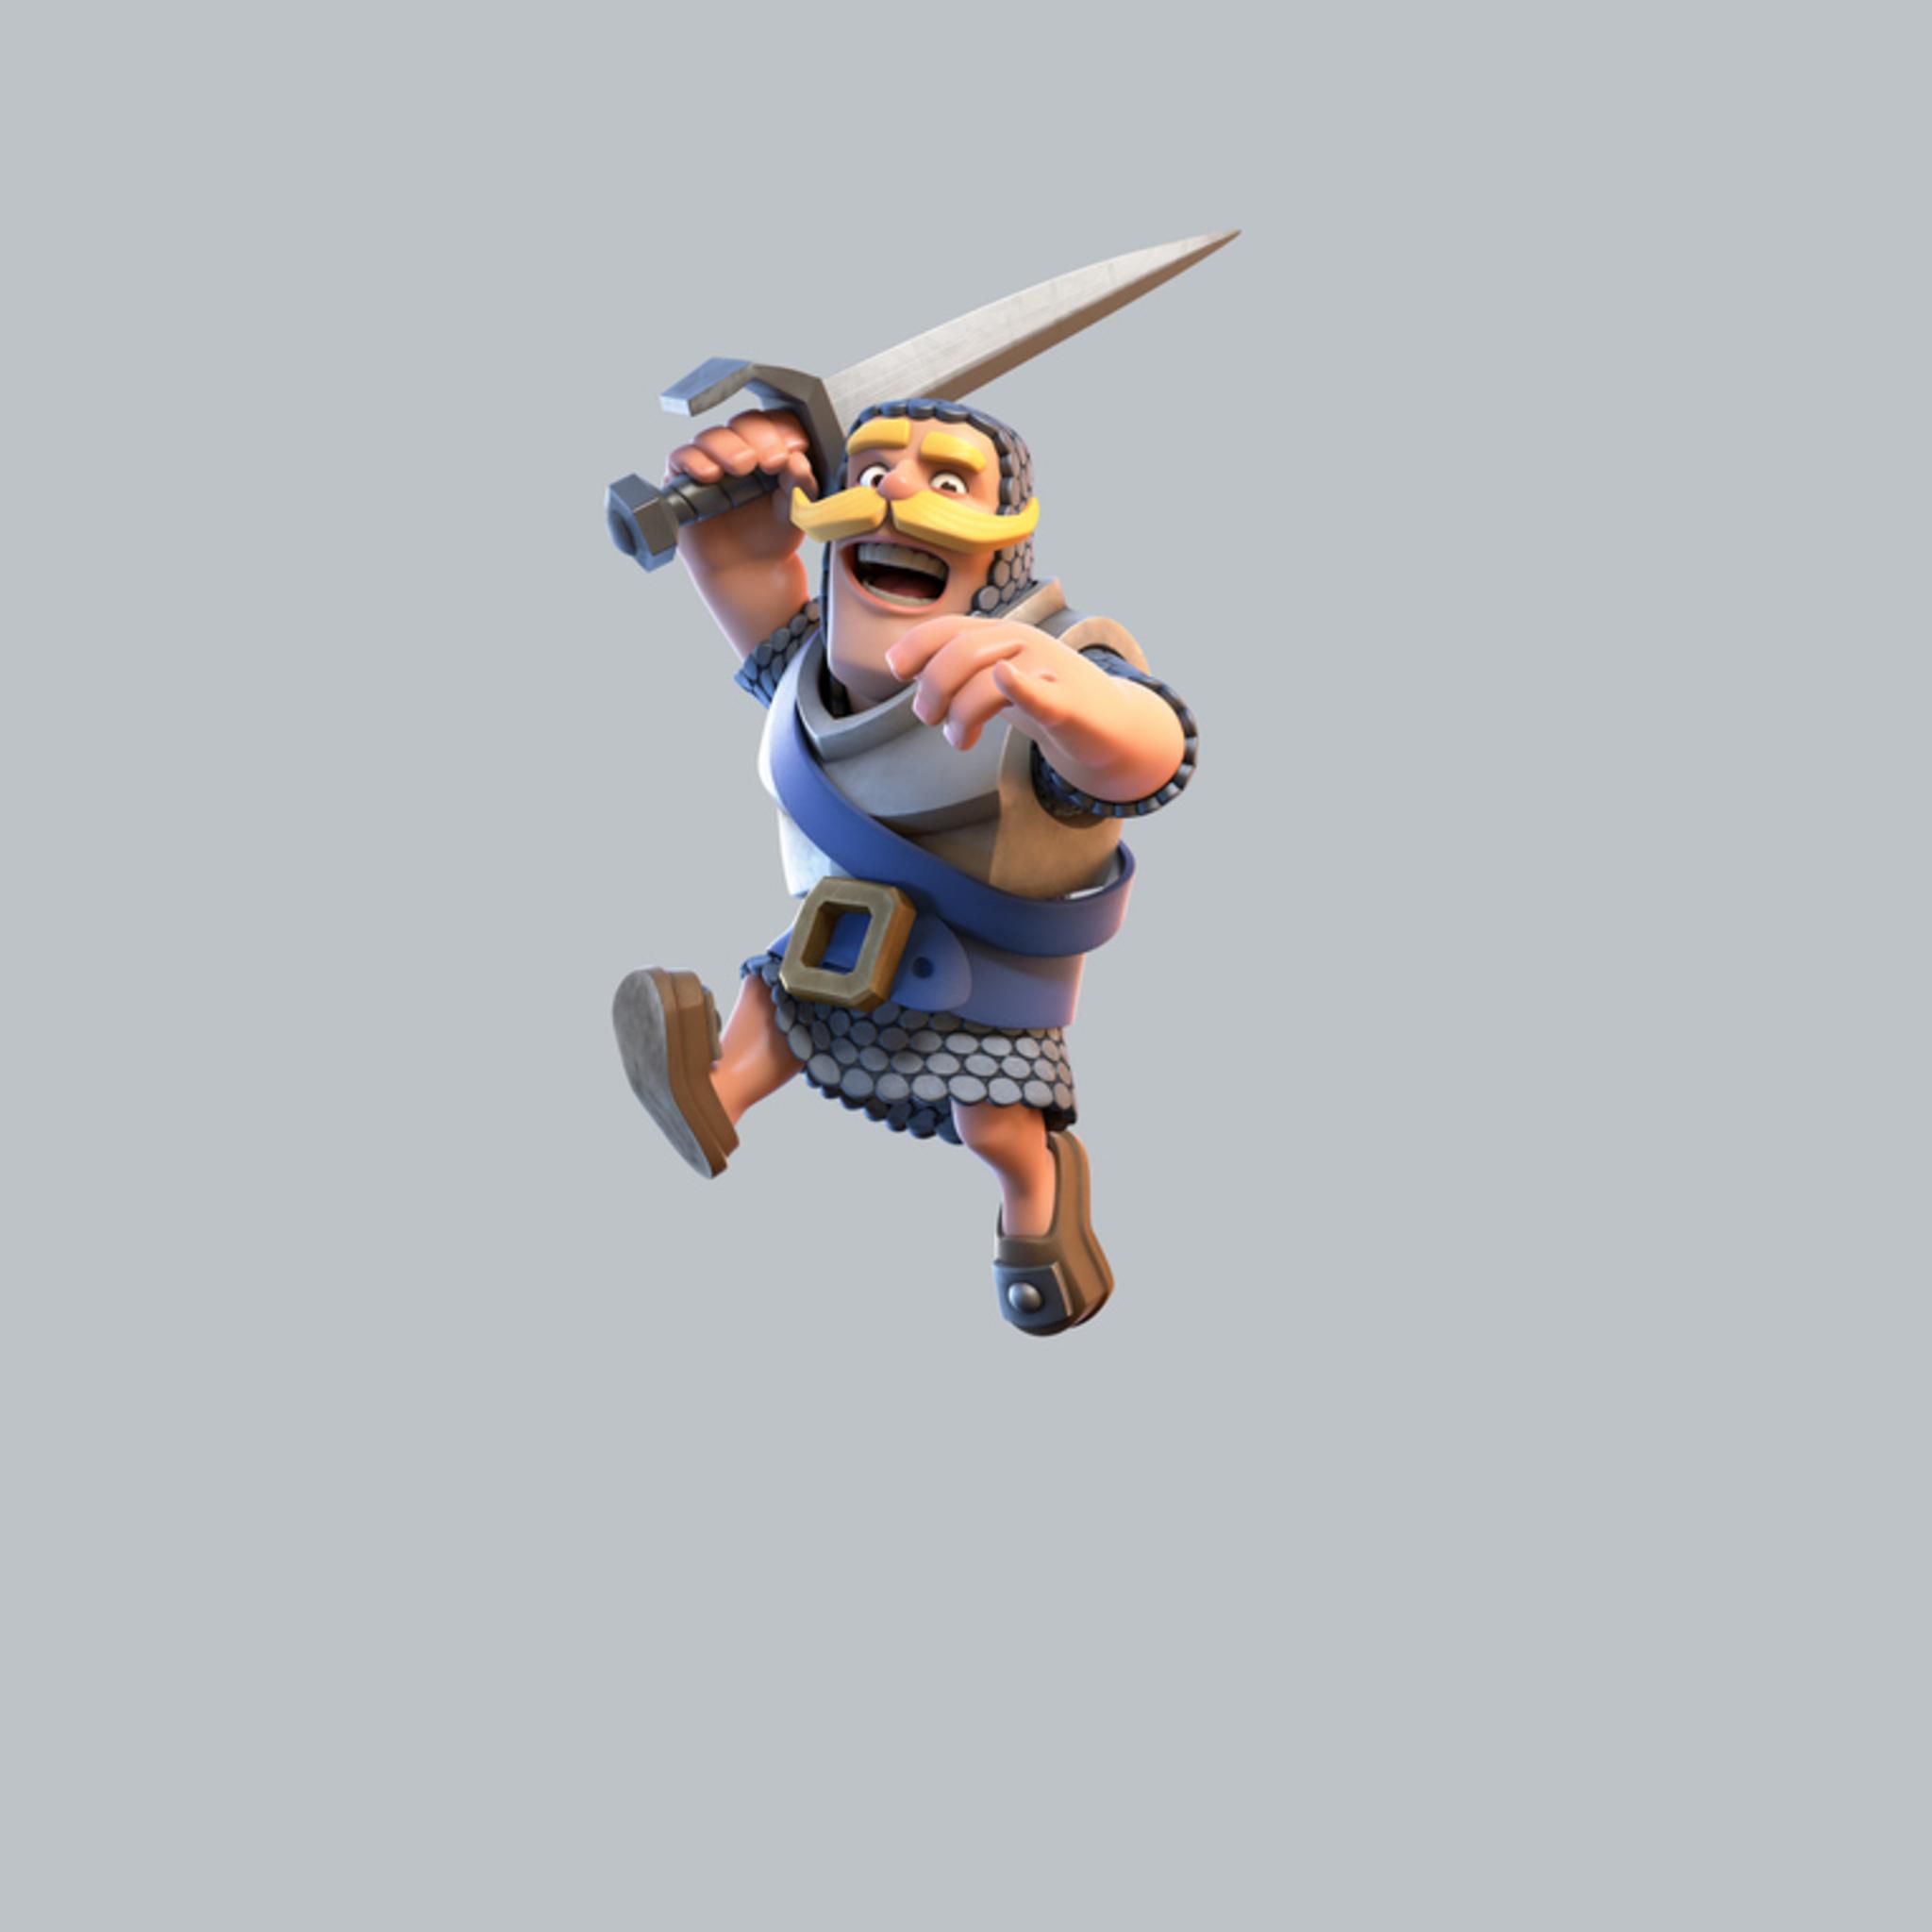 2048x2048 Clash Royale Knight Ipad Air HD 4k Wallpapers ...